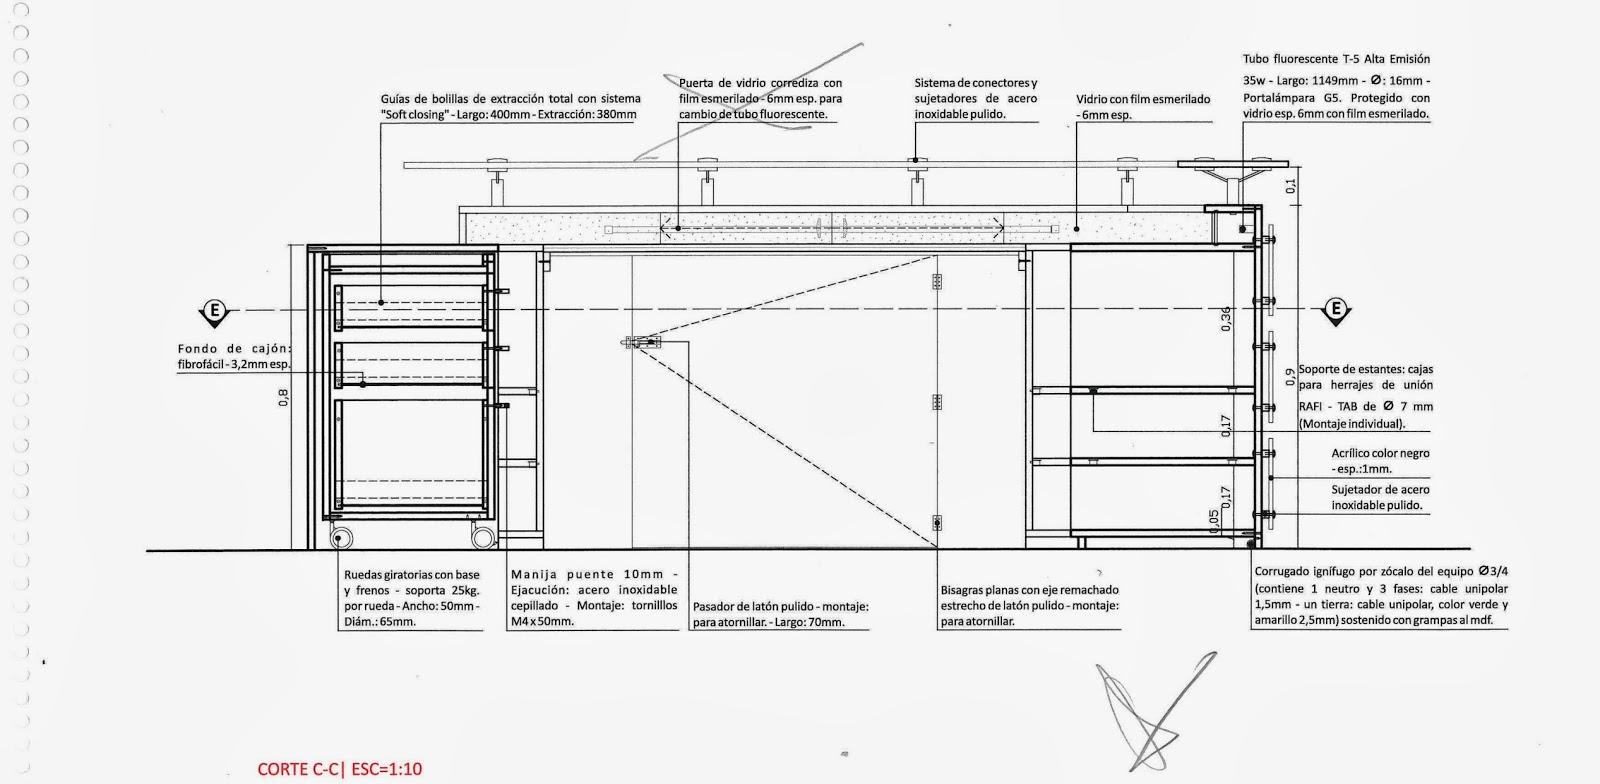 Muebles Detalles - Ejemplos De Representaci N Del Subsector En Escala 1 20 Y Del [mjhdah]http://2.bp.blogspot.com/-4-ujJ_lV8Is/UkoX2bmJd3I/AAAAAAAAAUw/hb3s6fUkG20/s1600/11+Detalle+c+mueble+1-2.jpg